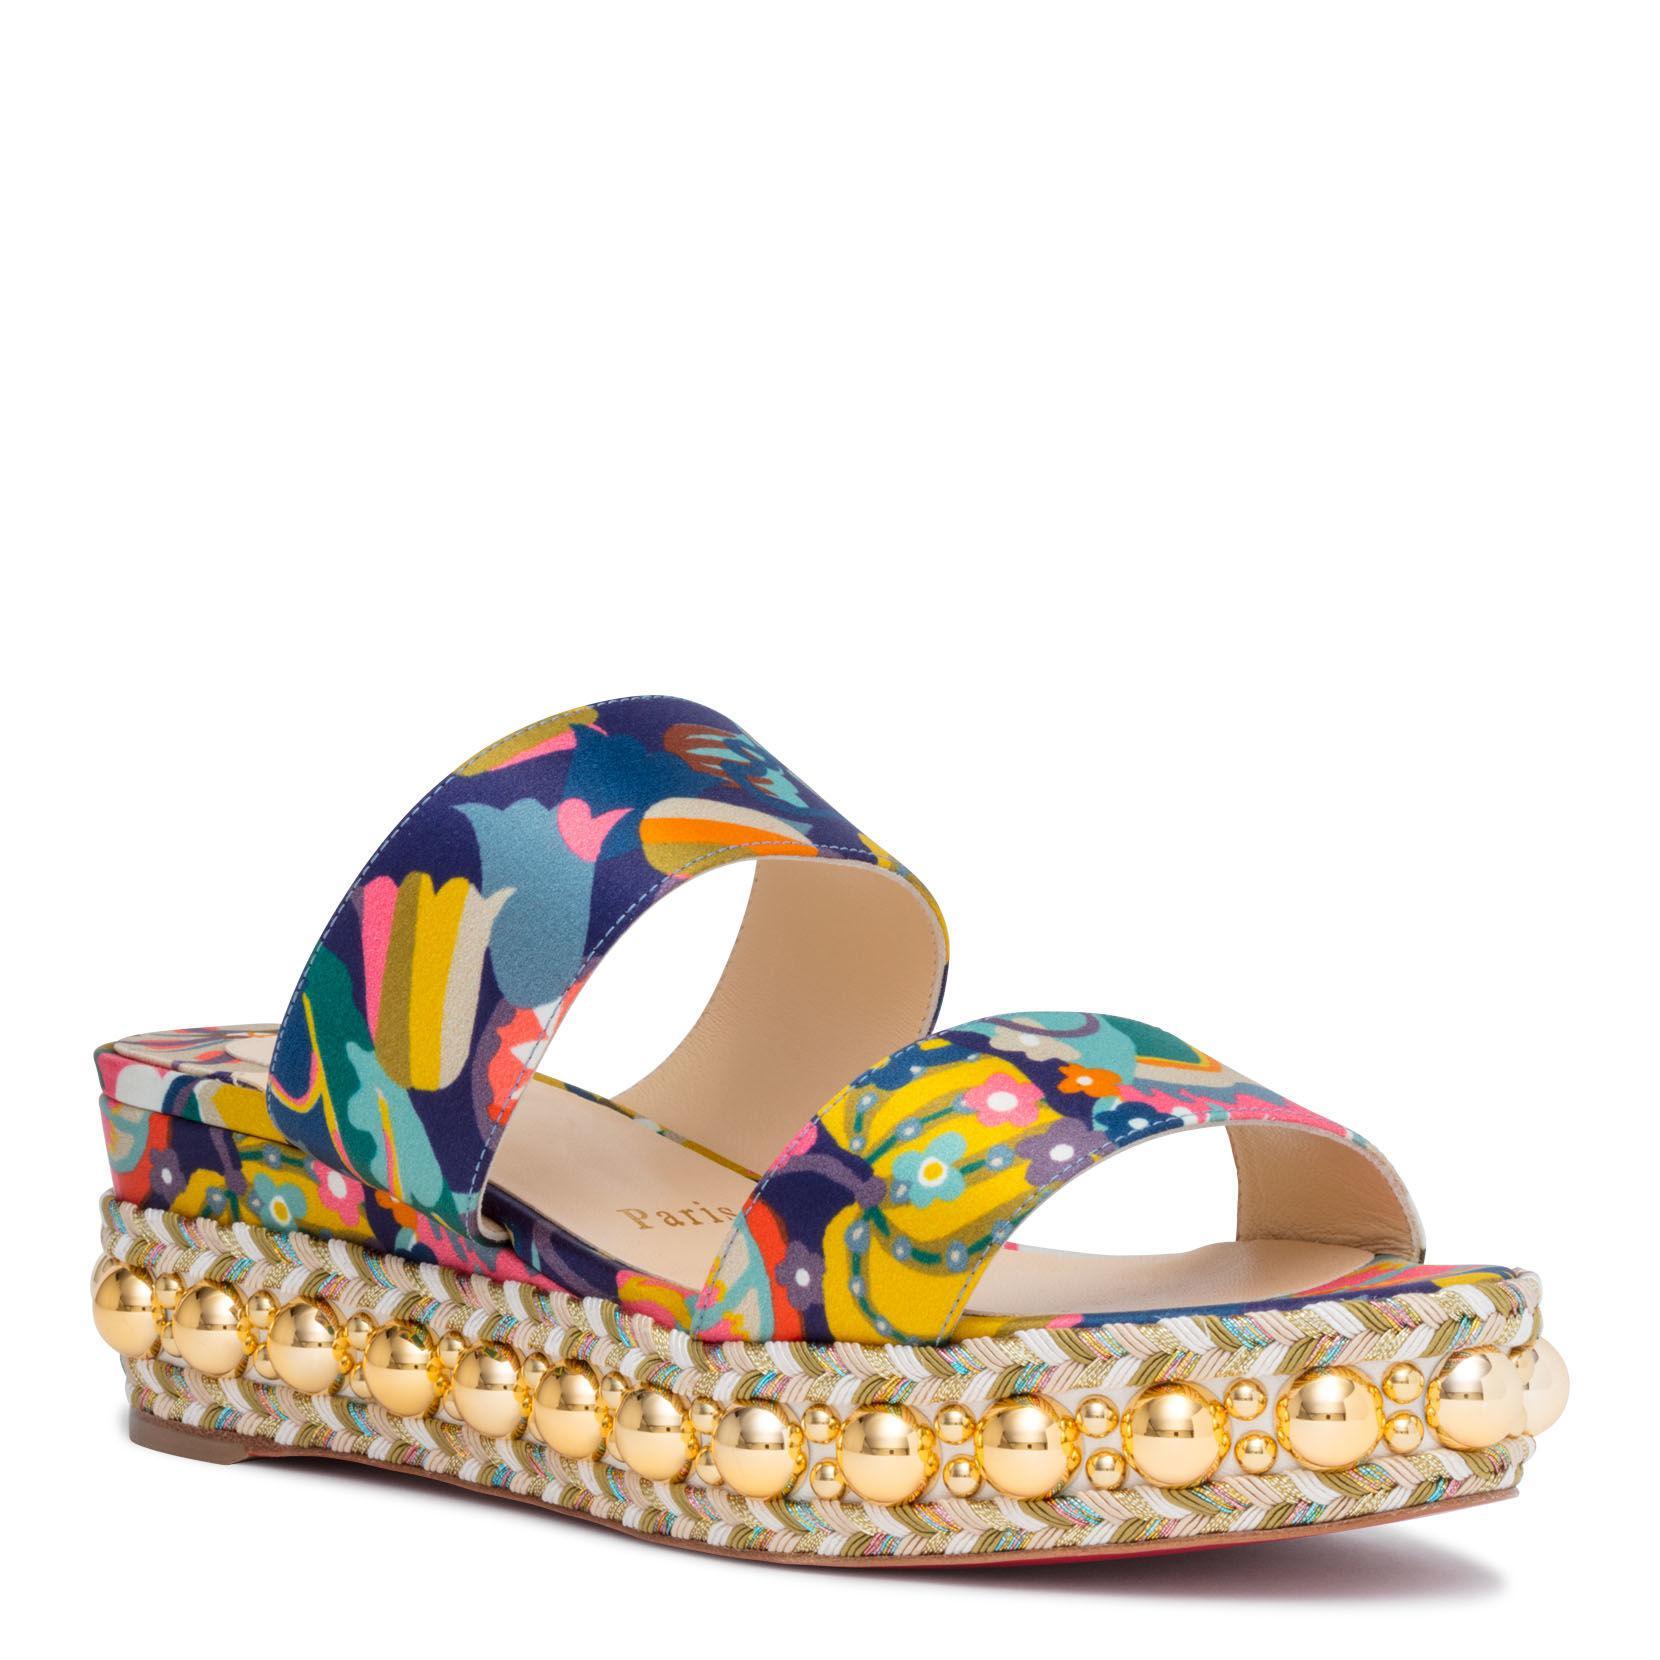 bcbe599f68bc4 Women's Blue Janitag 60 Satin Multicolor Sandals